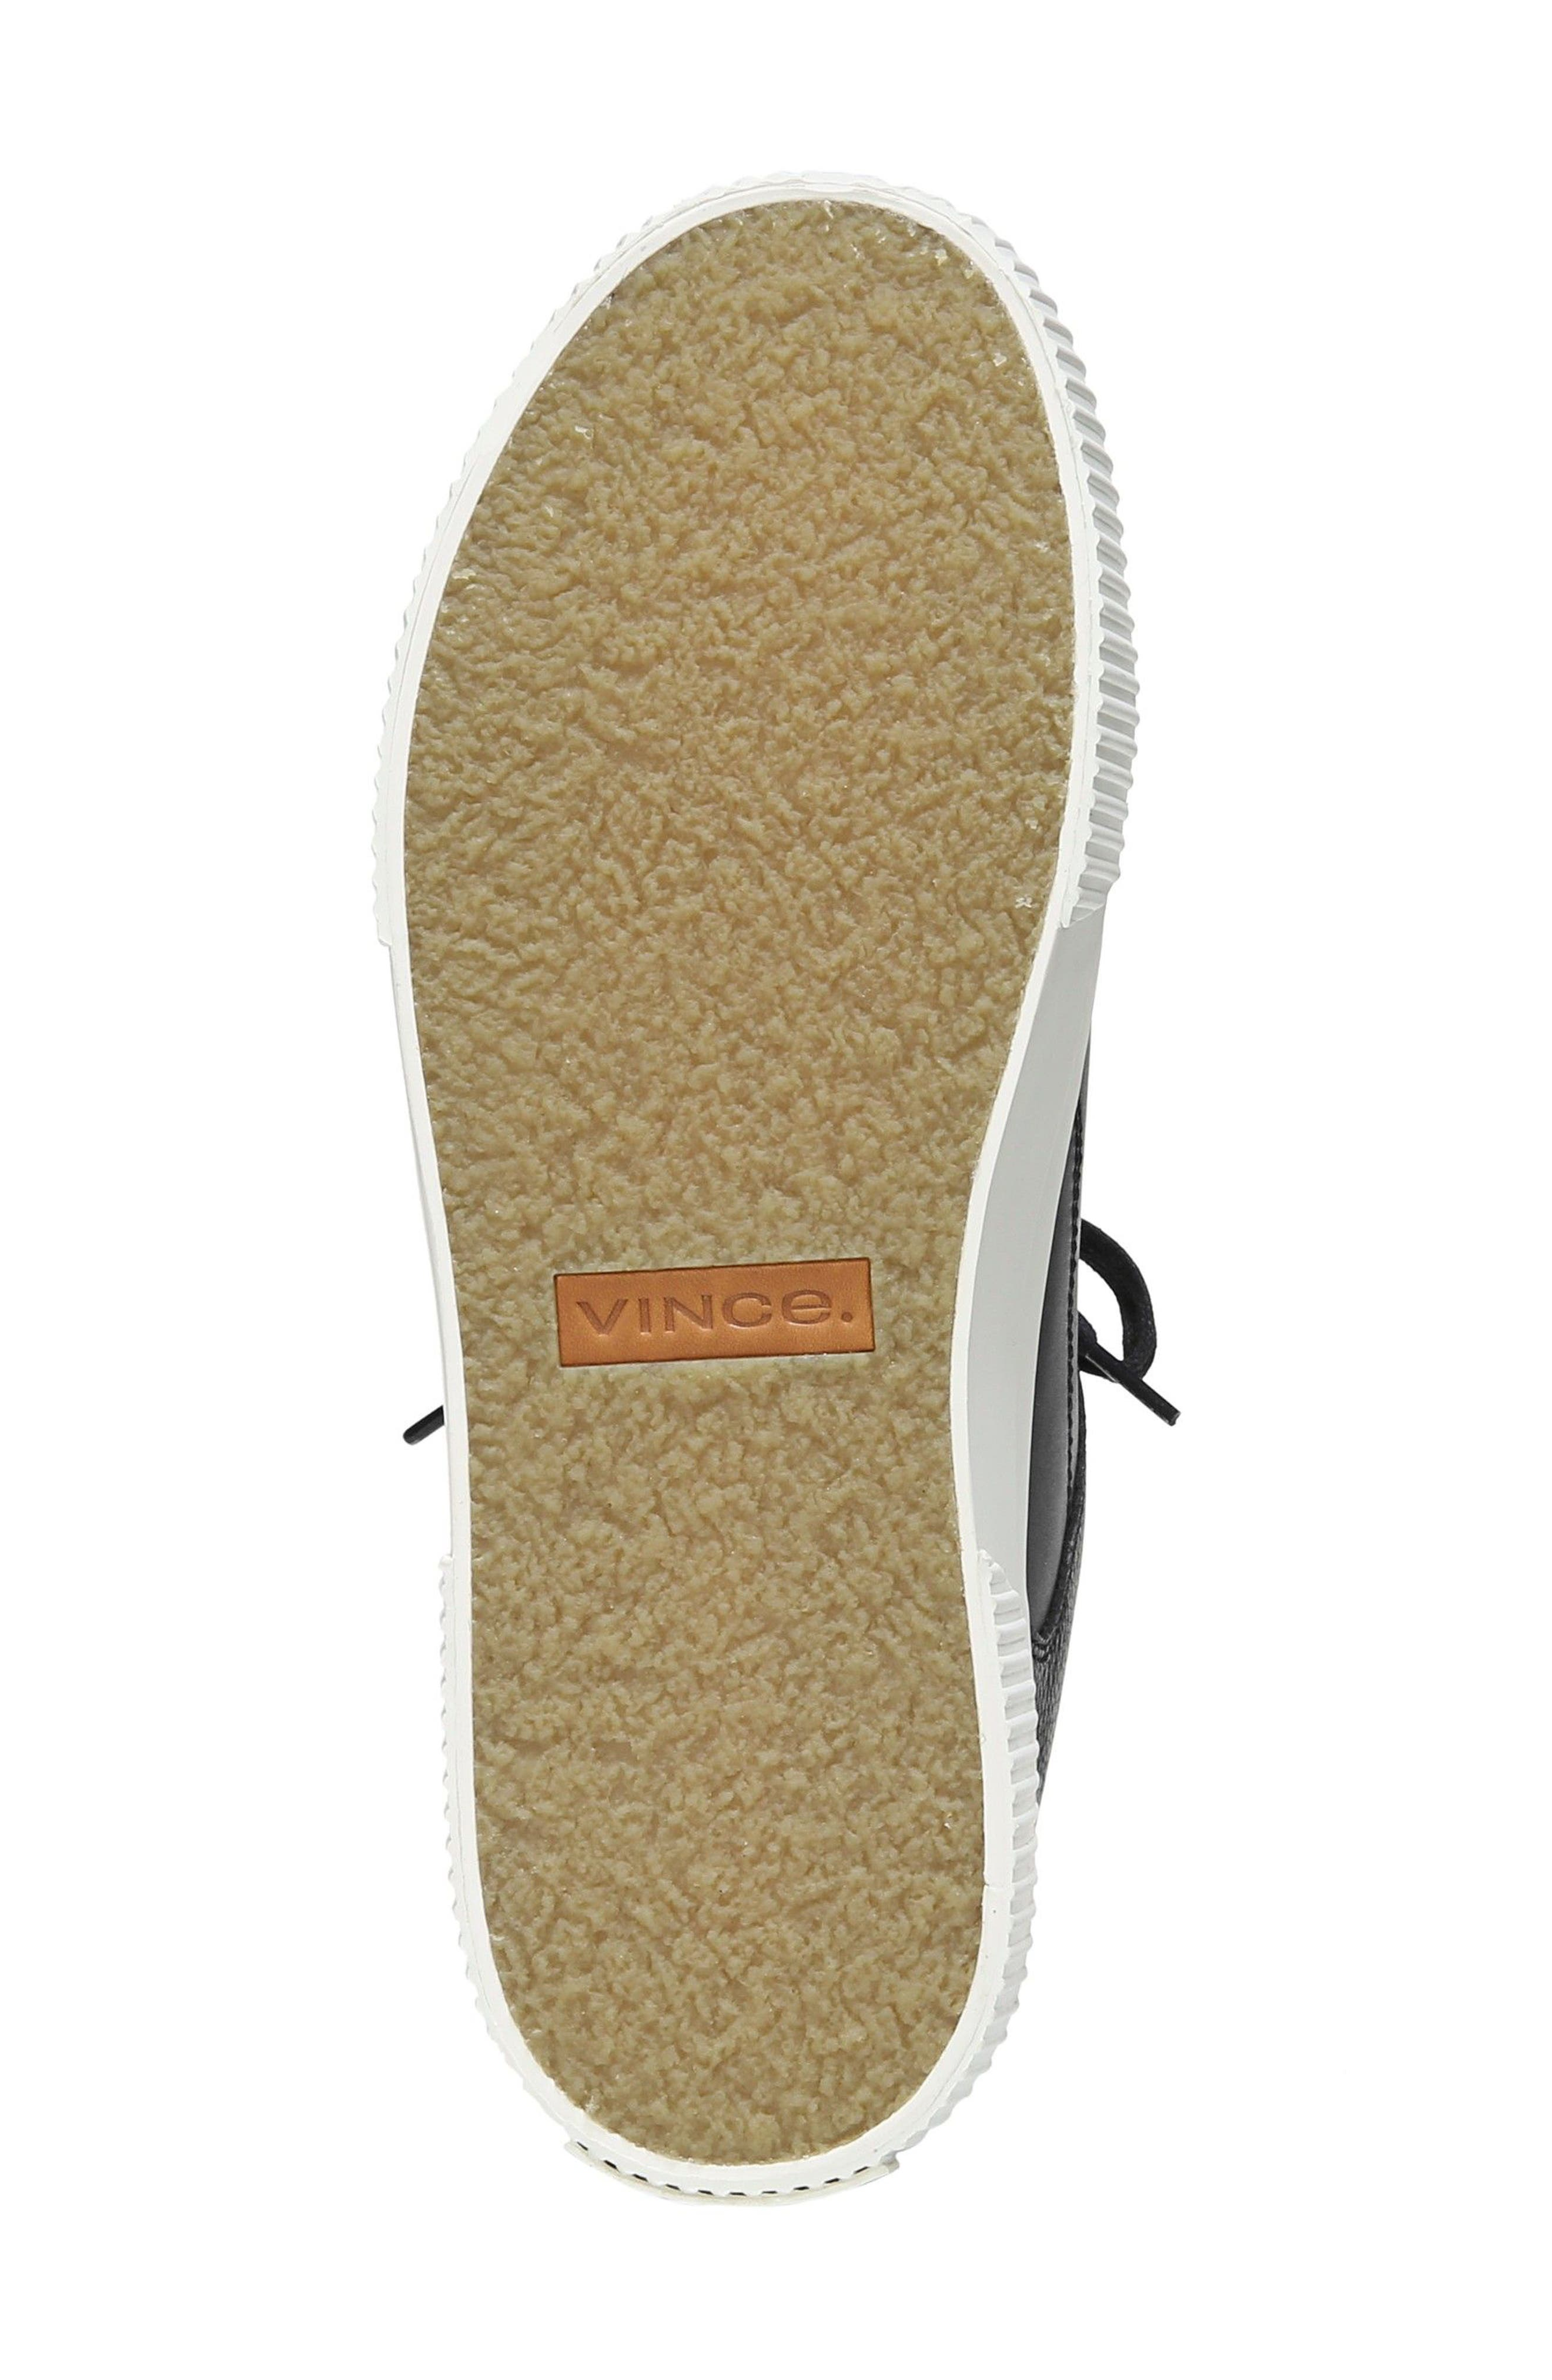 Kess Slip-On Sneaker,                             Alternate thumbnail 6, color,                             Coastal